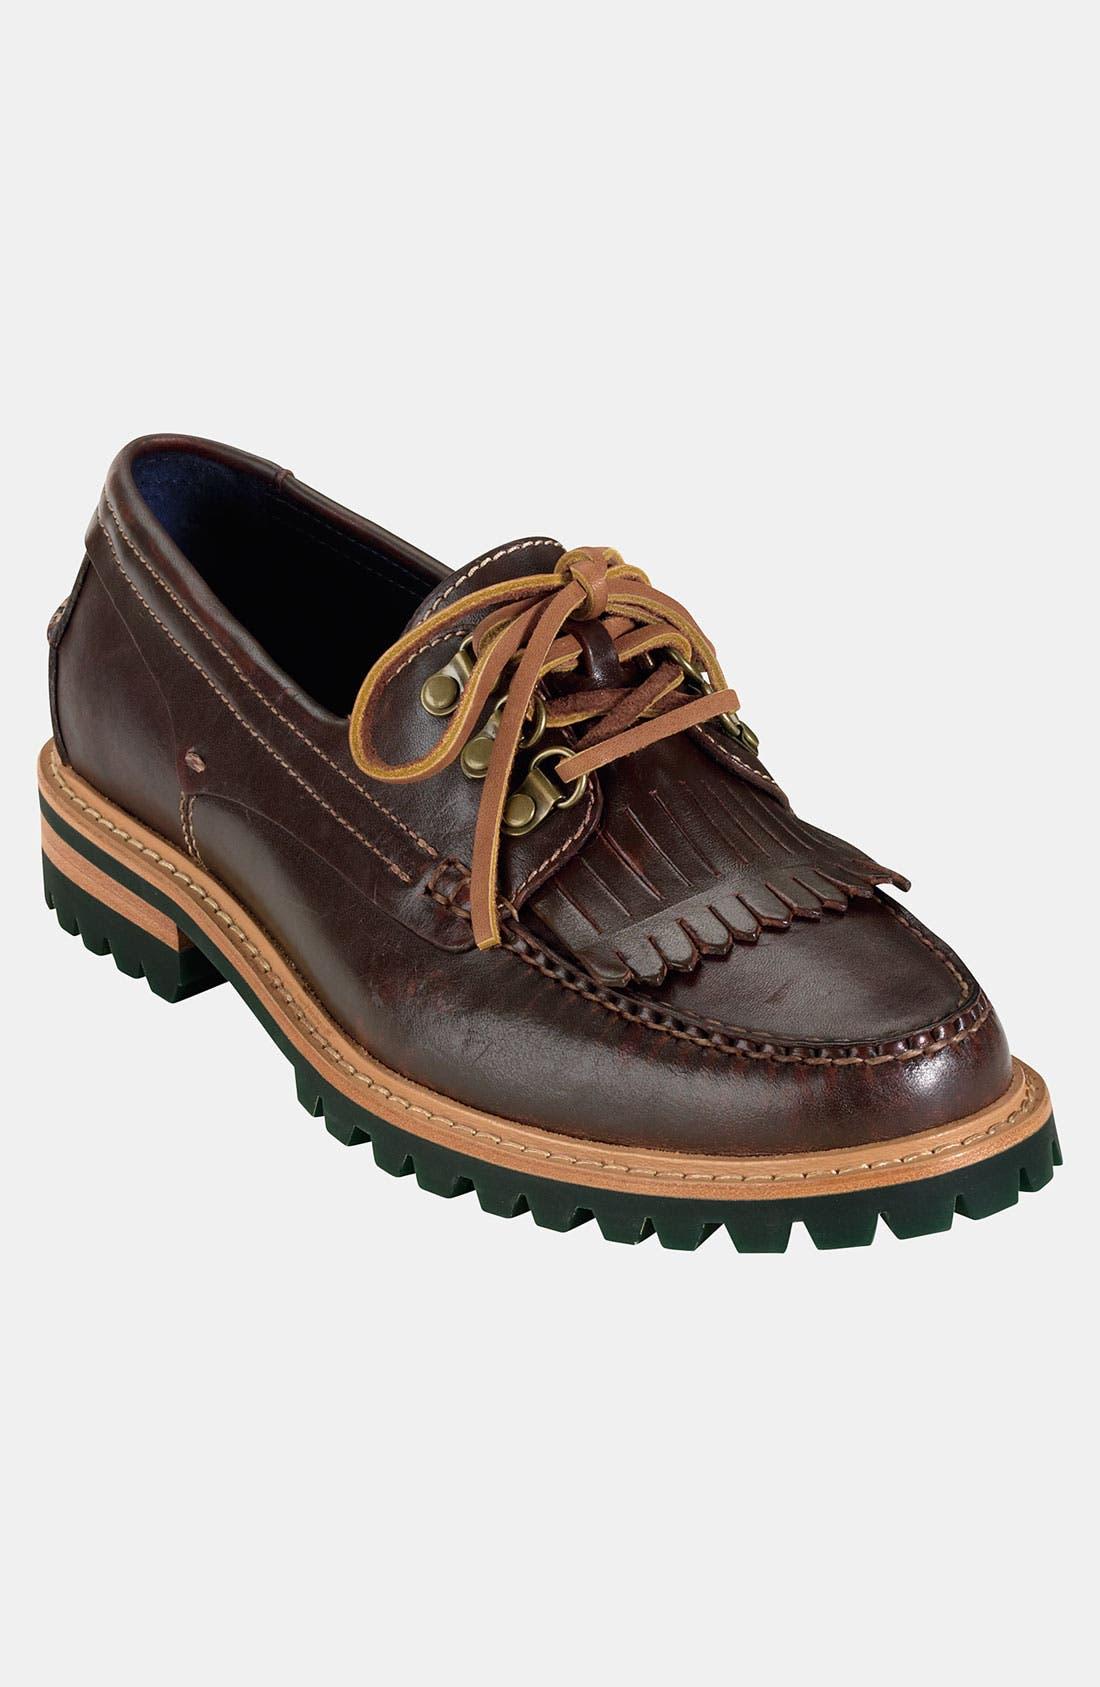 Main Image - Cole Haan 'Monroe' Kiltie Boat Shoe   (Men)